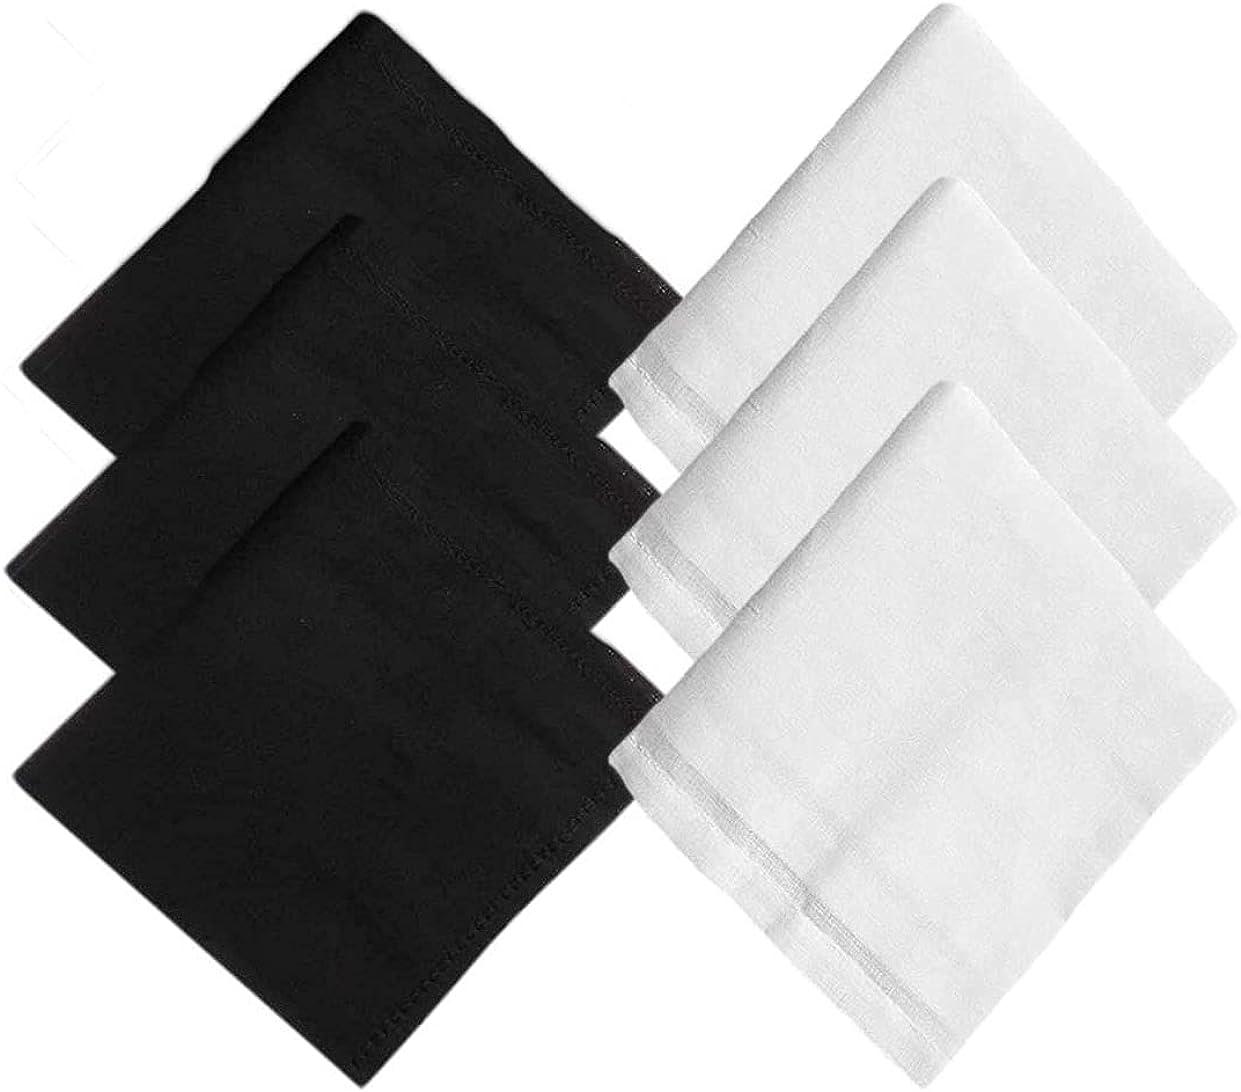 Kalagiri Cotton Premium Collection Black And White Handkerchiefs Hanky Set For Men - Pack of 6 Pcs